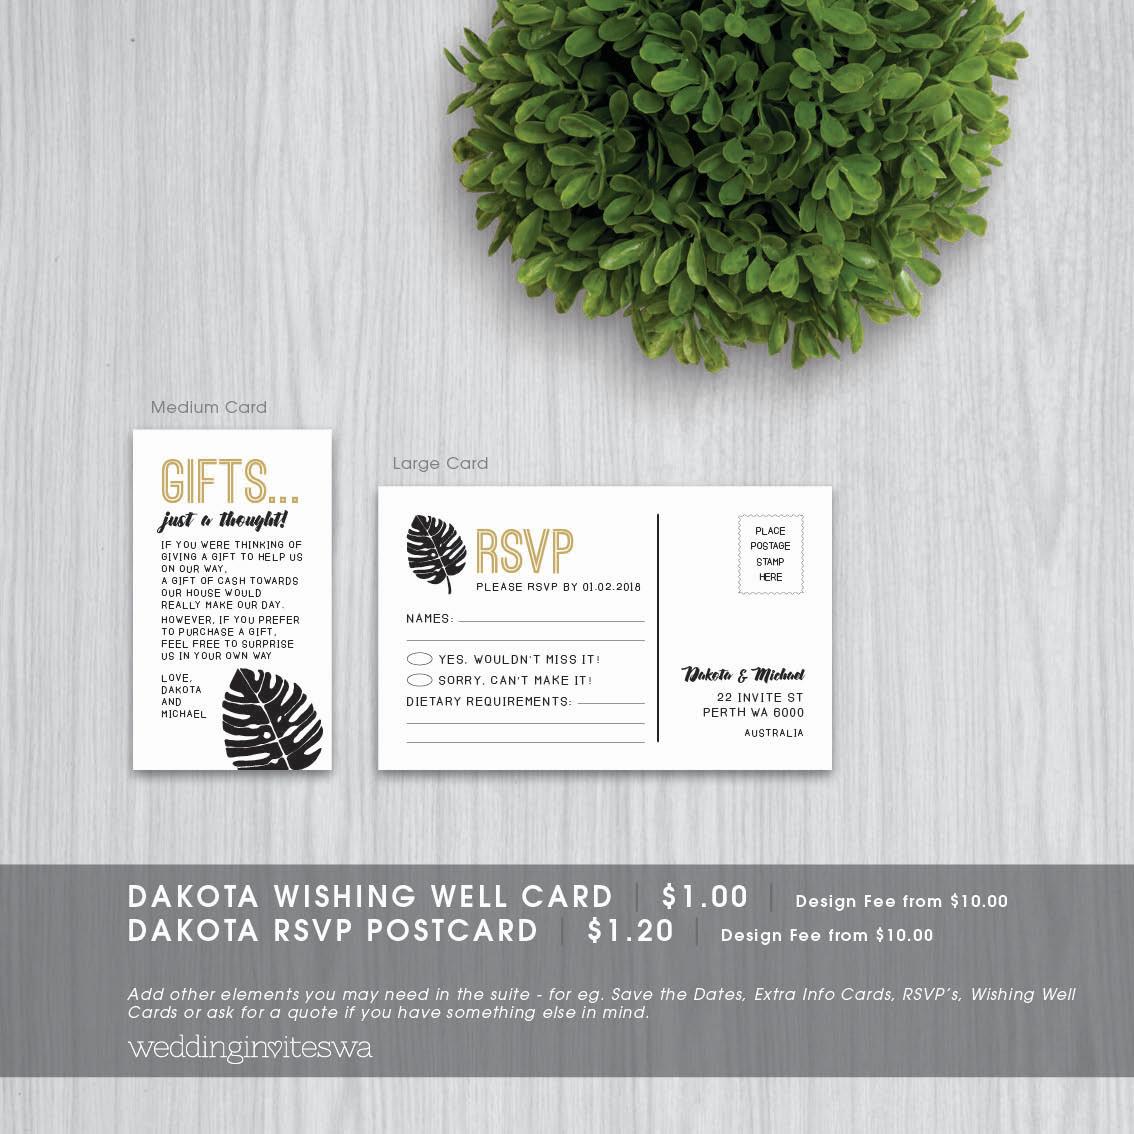 DAKOTA_extra cards